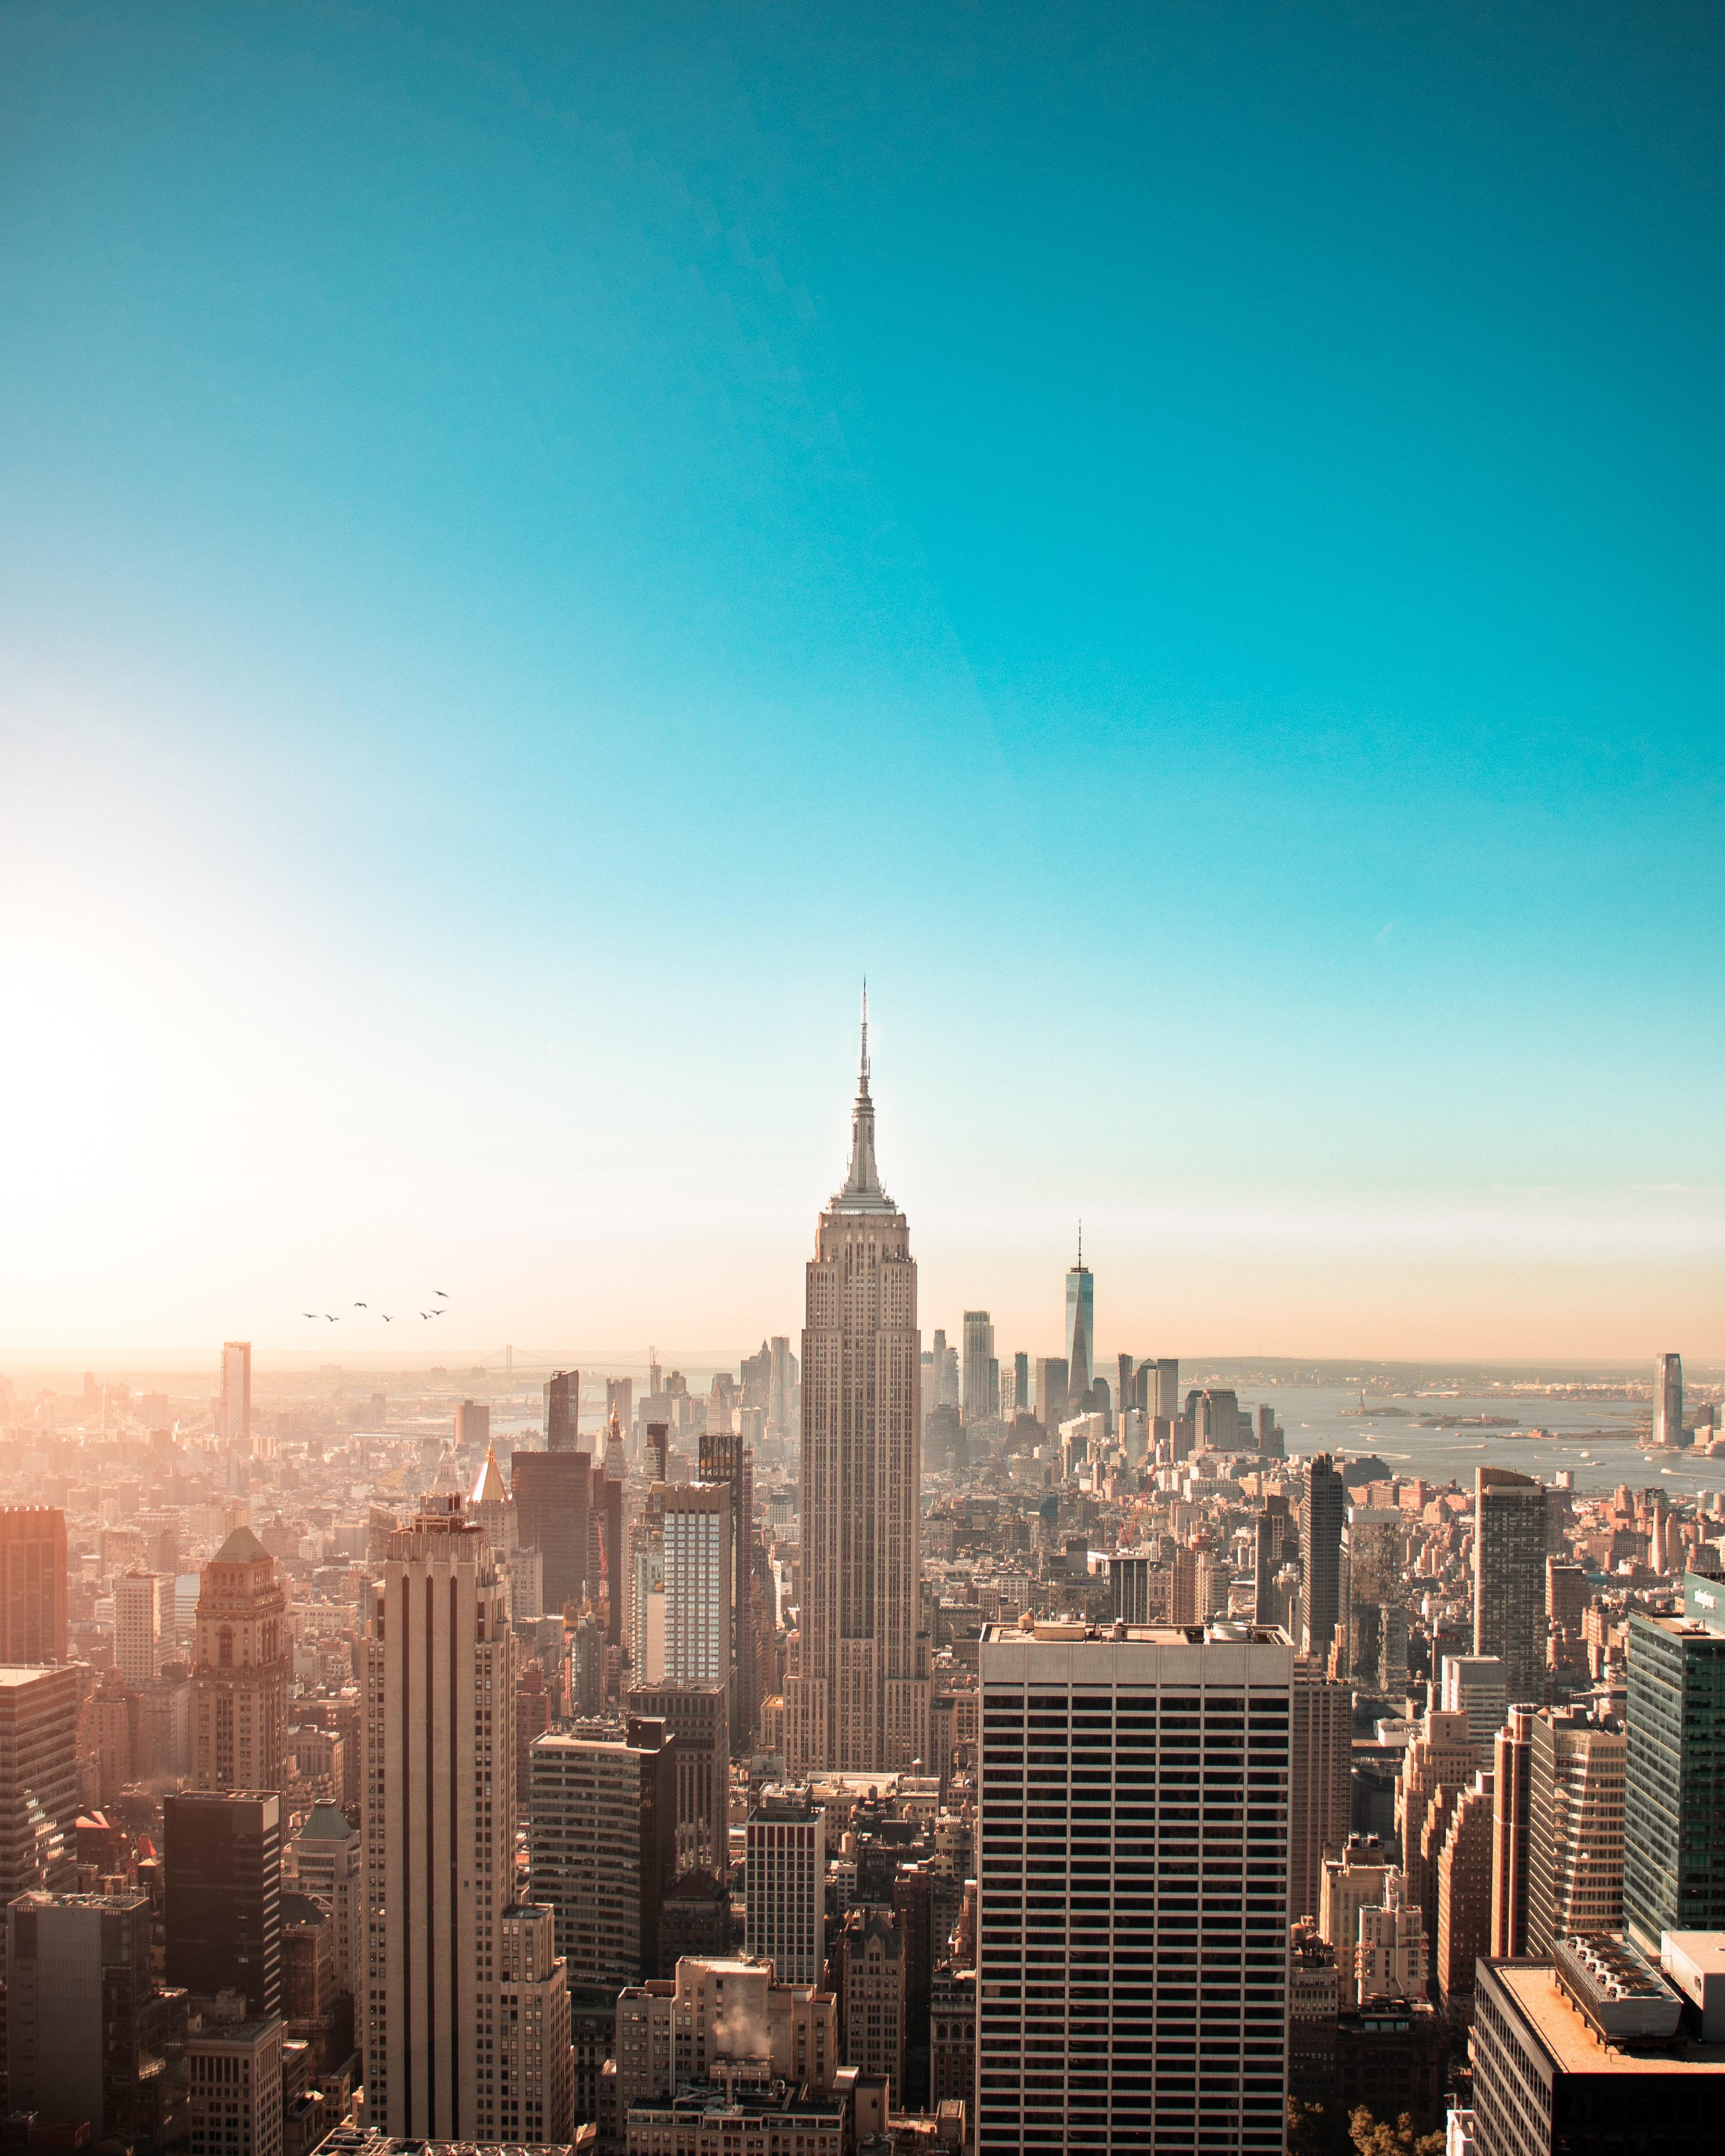 Photo Of New York City Cityscape Free Stock Photo